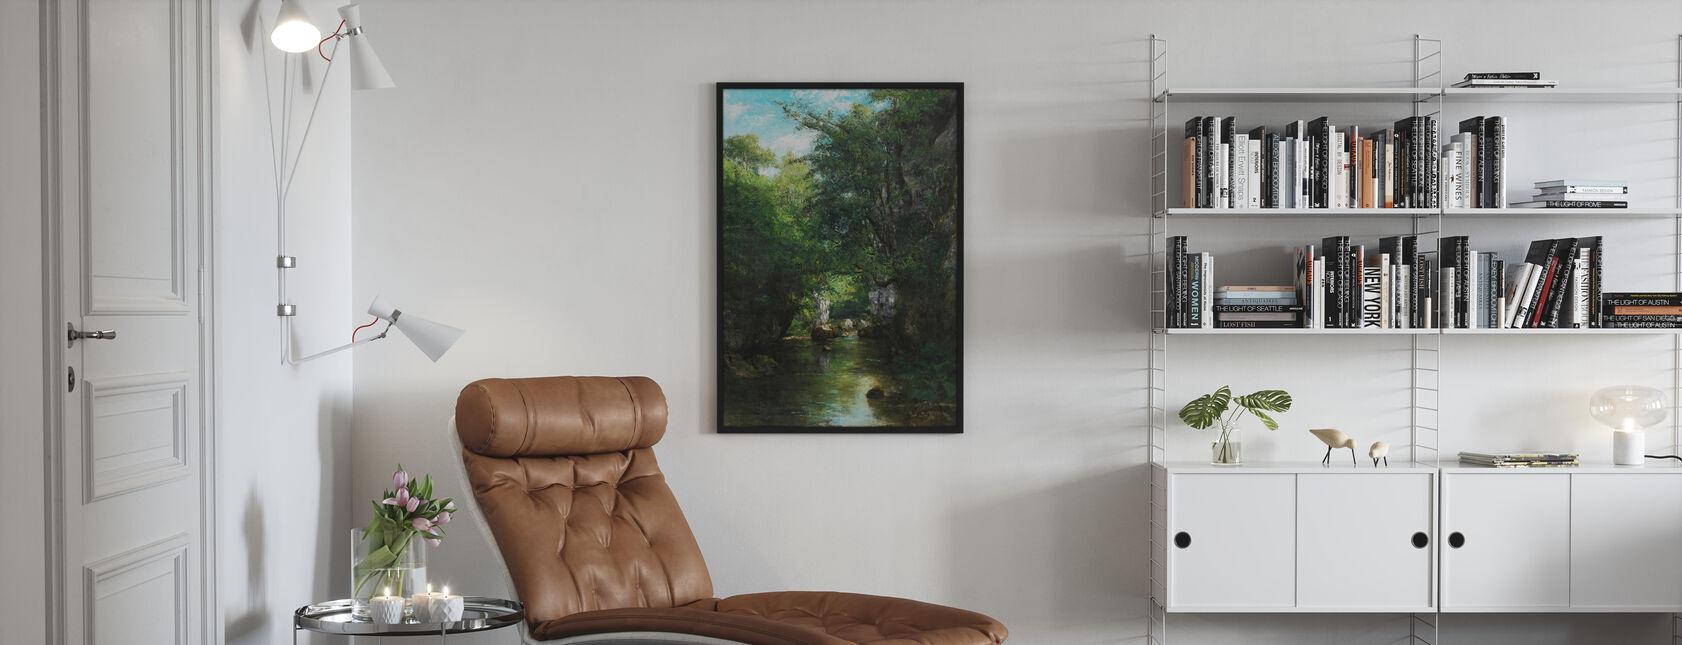 Vattenflöde - Gustave Courbet - Poster - Vardagsrum